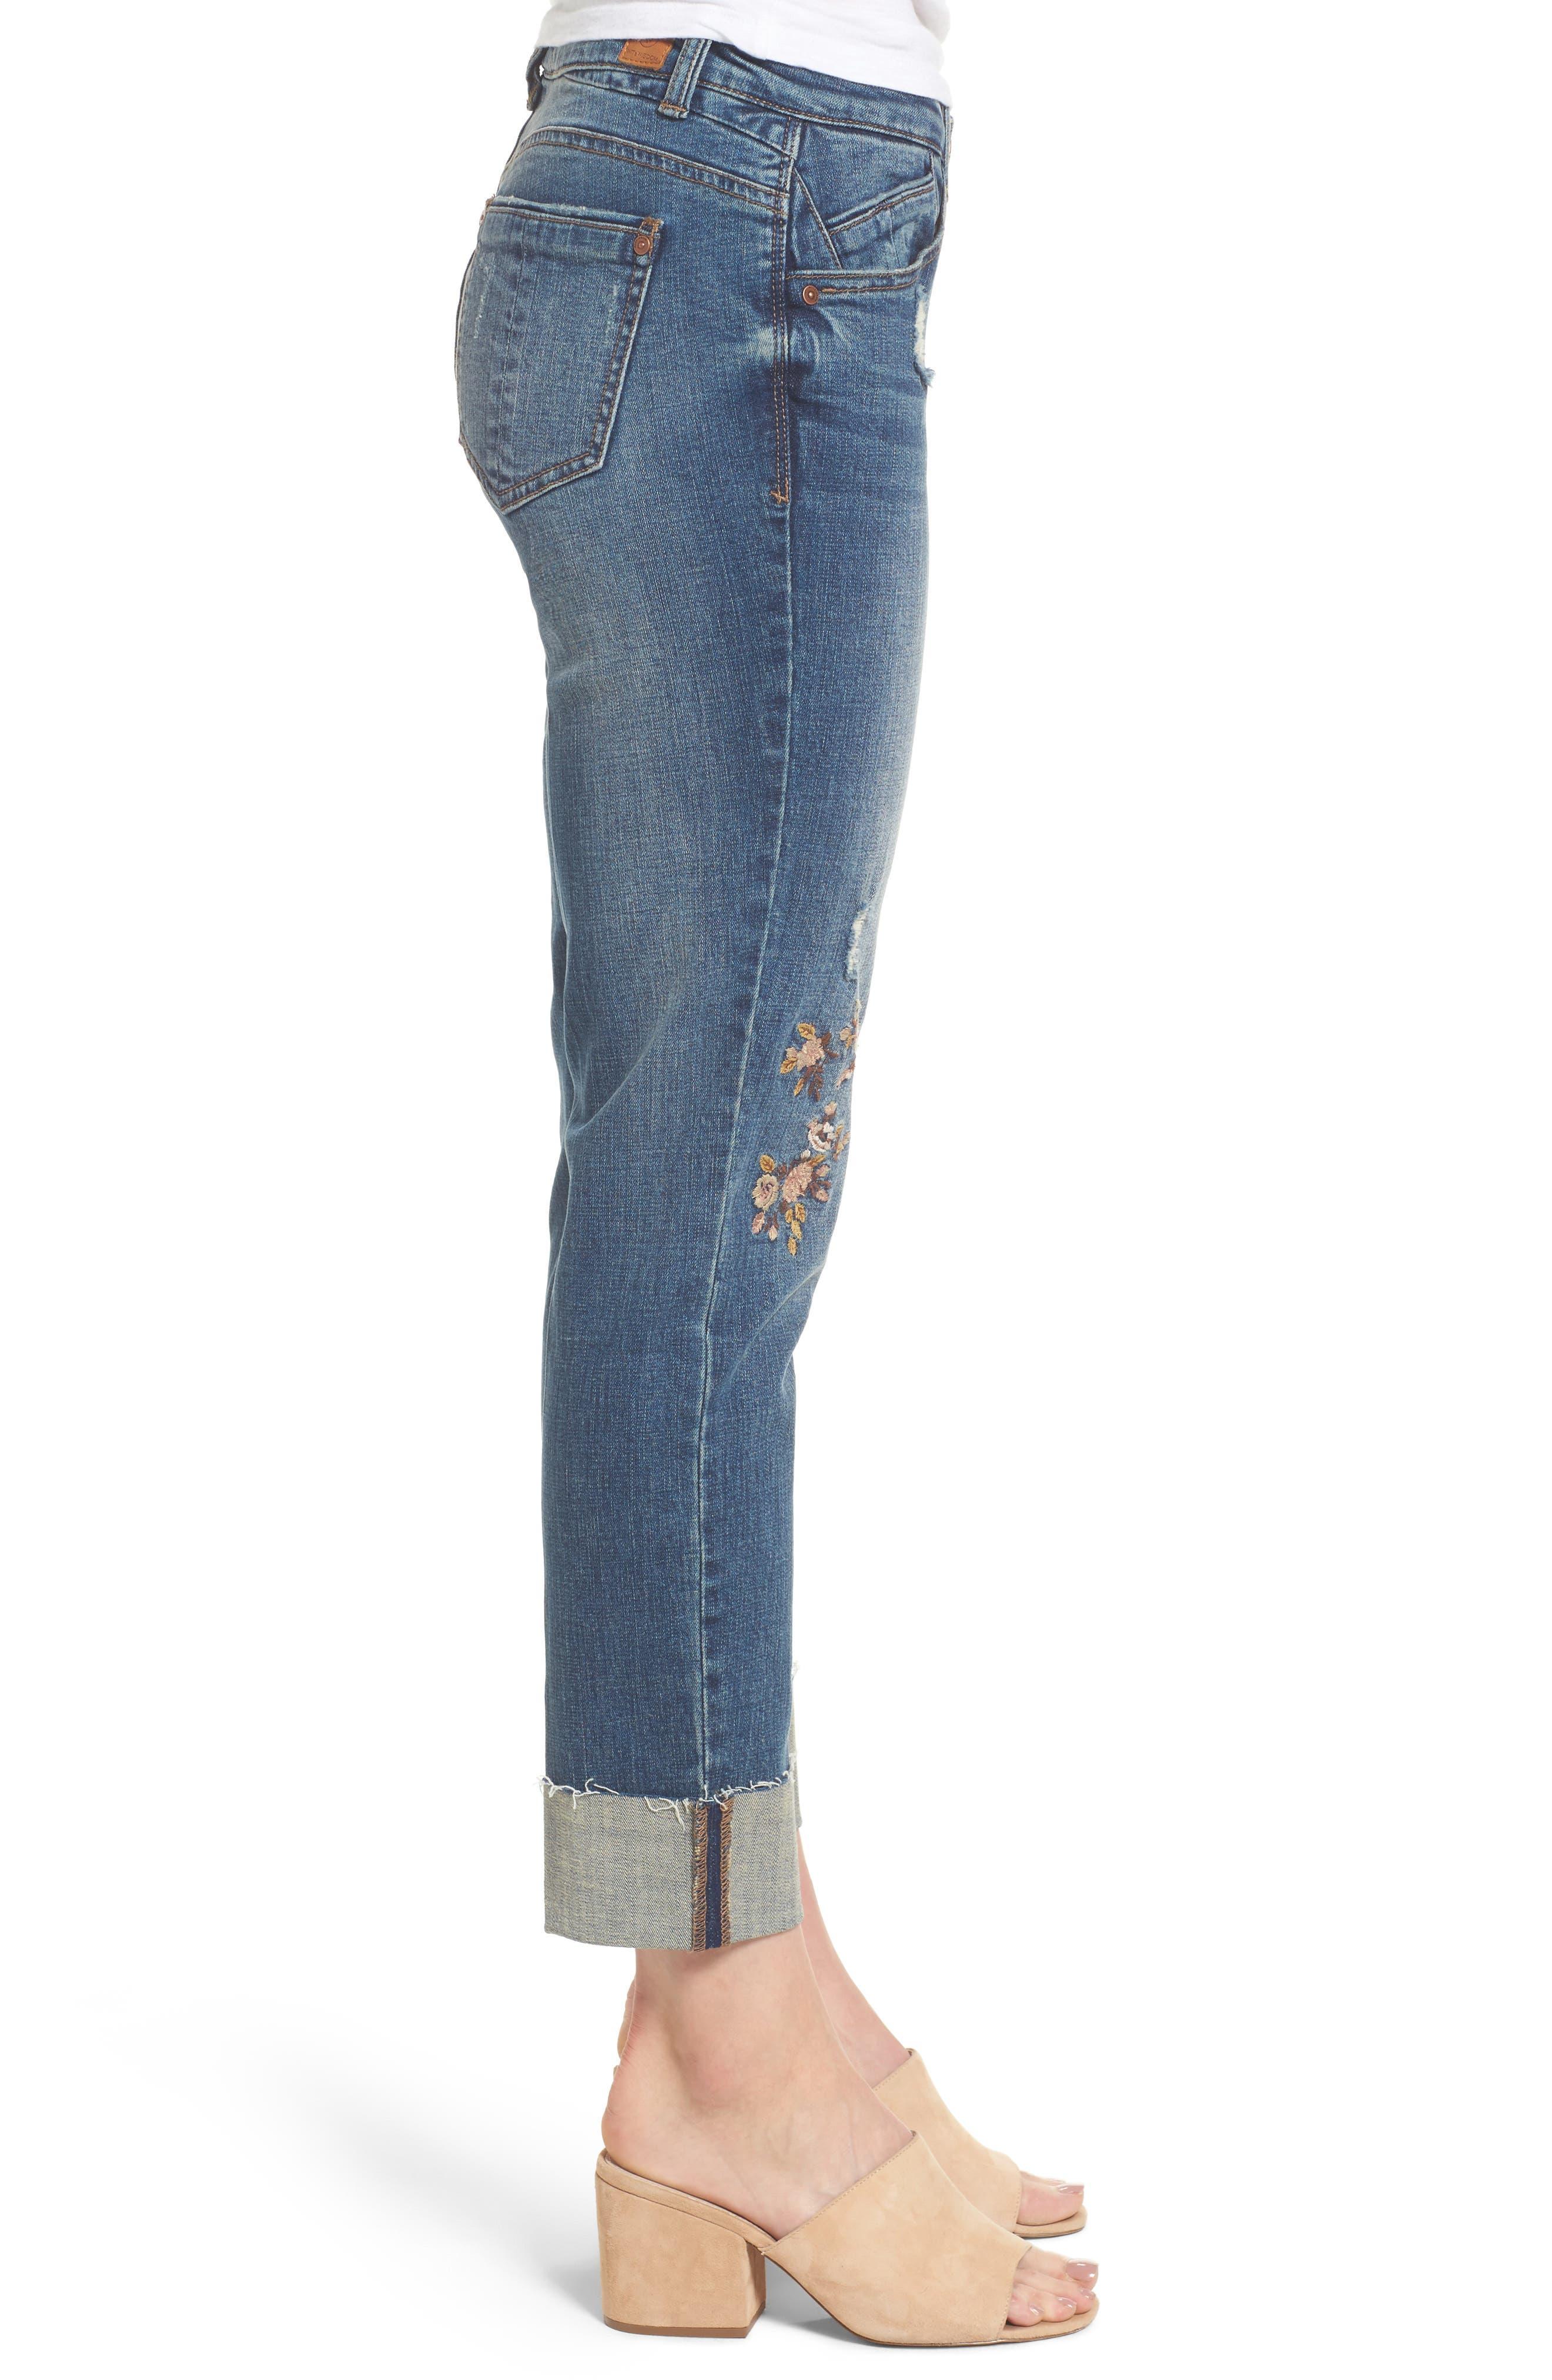 Alternate Image 3  - Wit & Wisdom Flex-ellent Embroidered Boyfriend Jeans (Nordstrom Exclusive) (Regular & Petite)